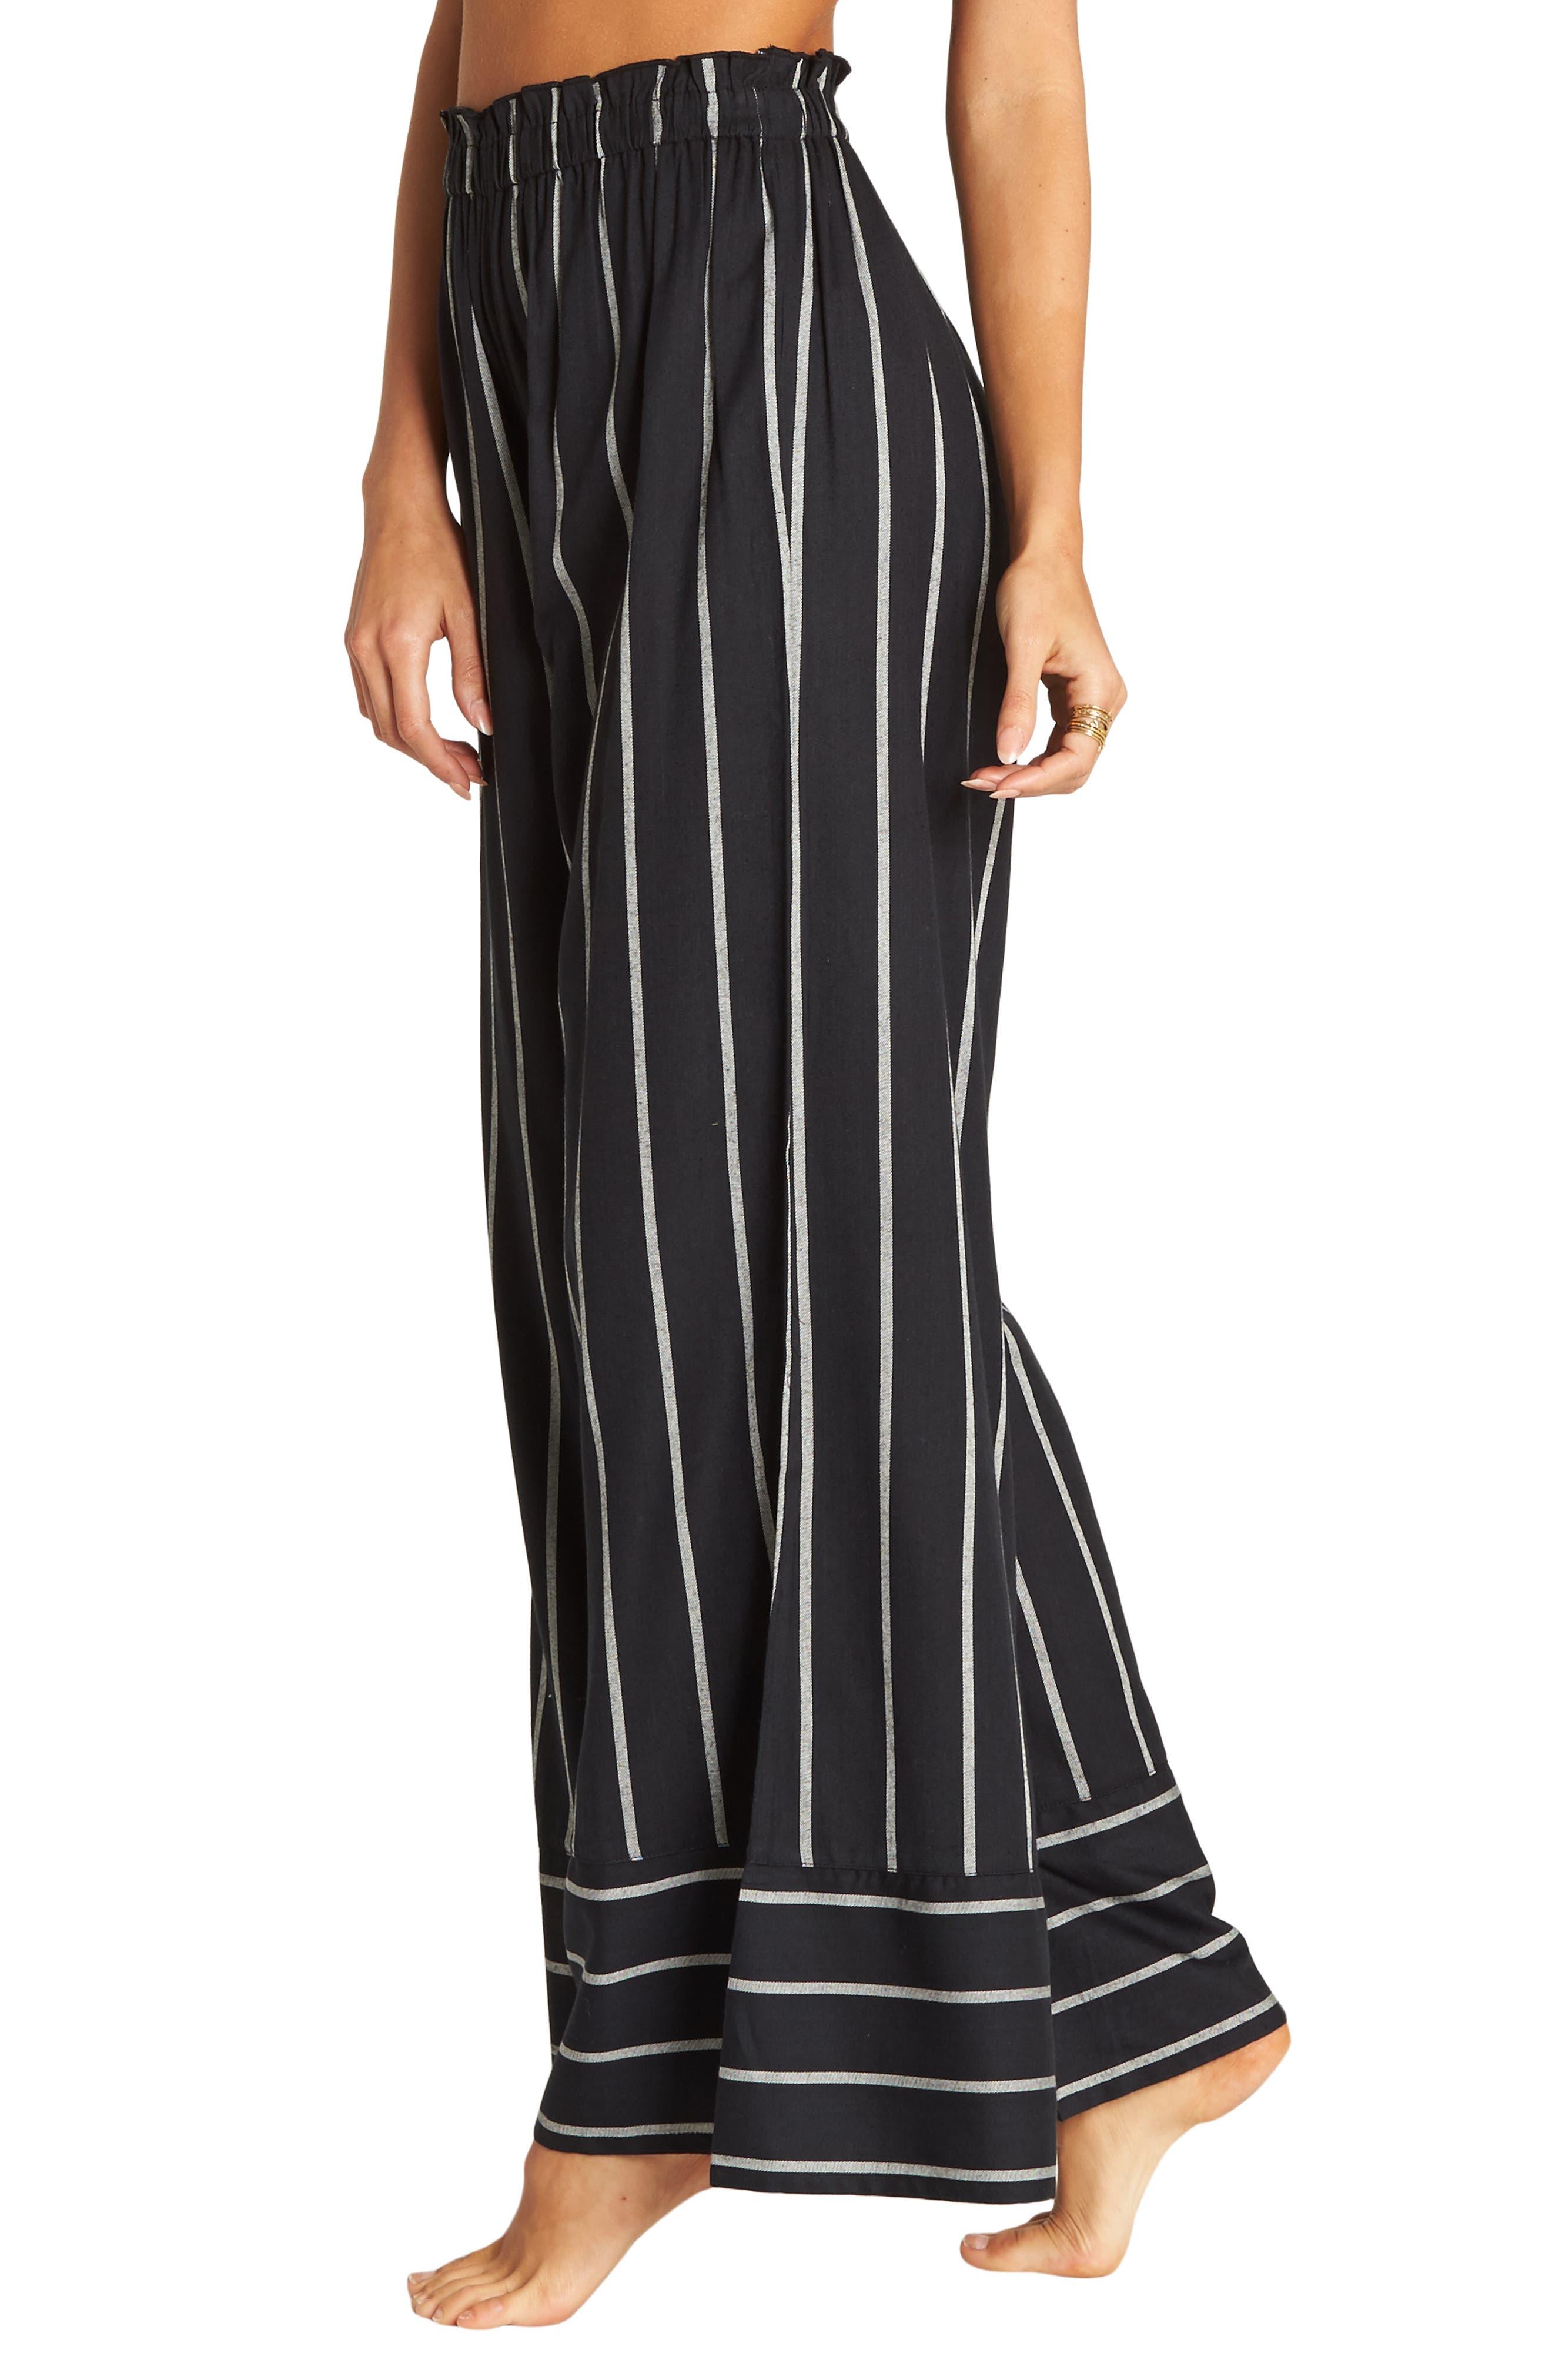 BILLABONG, Flip Out Stripe Wide Leg Pants, Main thumbnail 1, color, BLACK